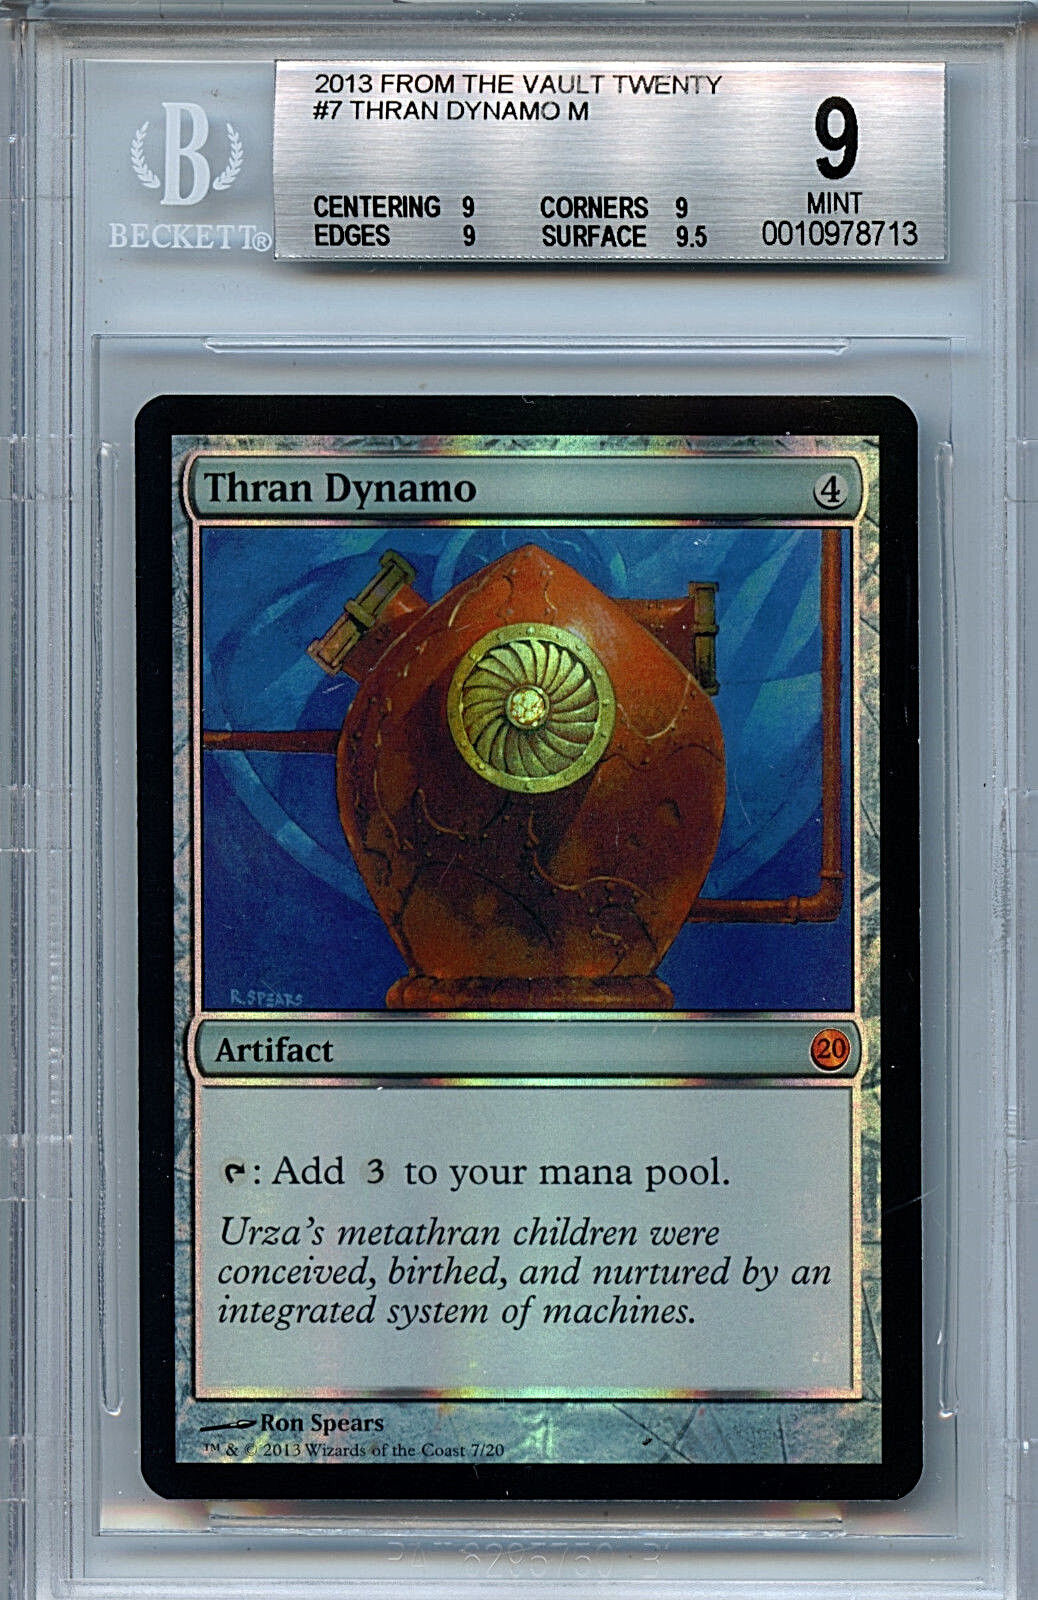 Mtg thran dynamo bgs 9,0 (9) - ftv zwanzig magie mystische folie amricons 8713